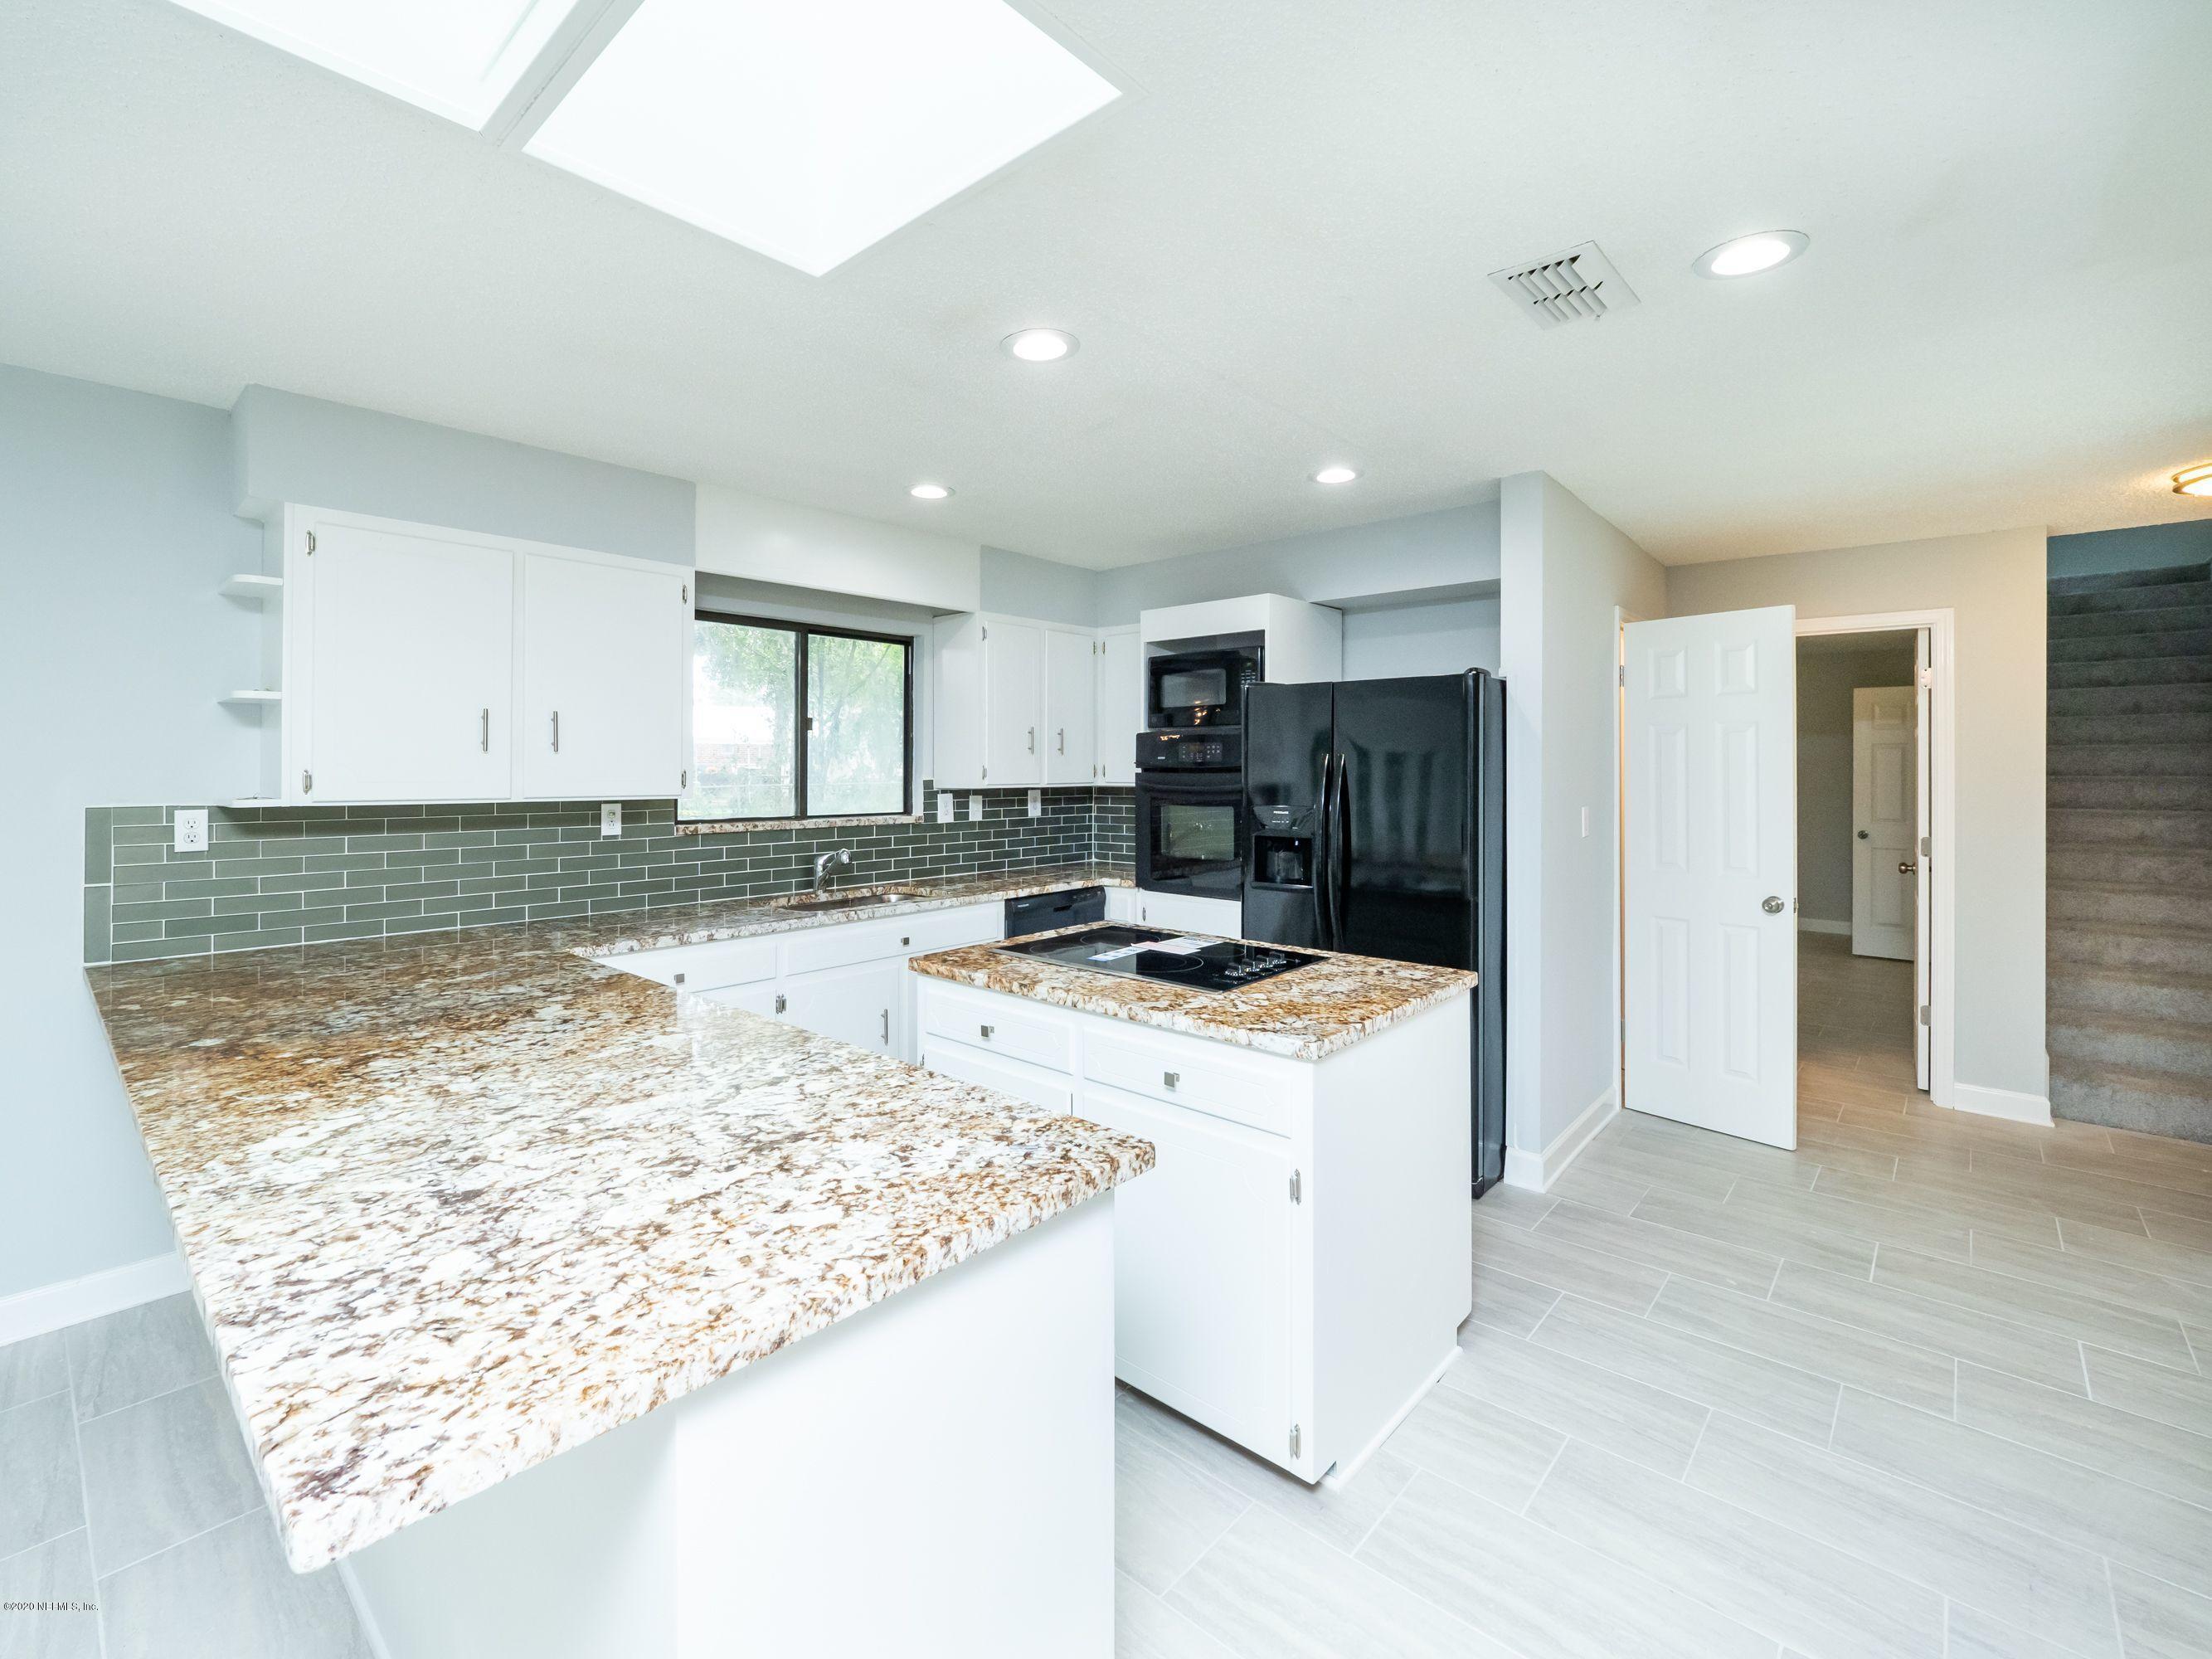 1671 OLD MIDDLEBURG, JACKSONVILLE, FLORIDA 32210, 3 Bedrooms Bedrooms, ,3 BathroomsBathrooms,Residential,For sale,OLD MIDDLEBURG,1079673